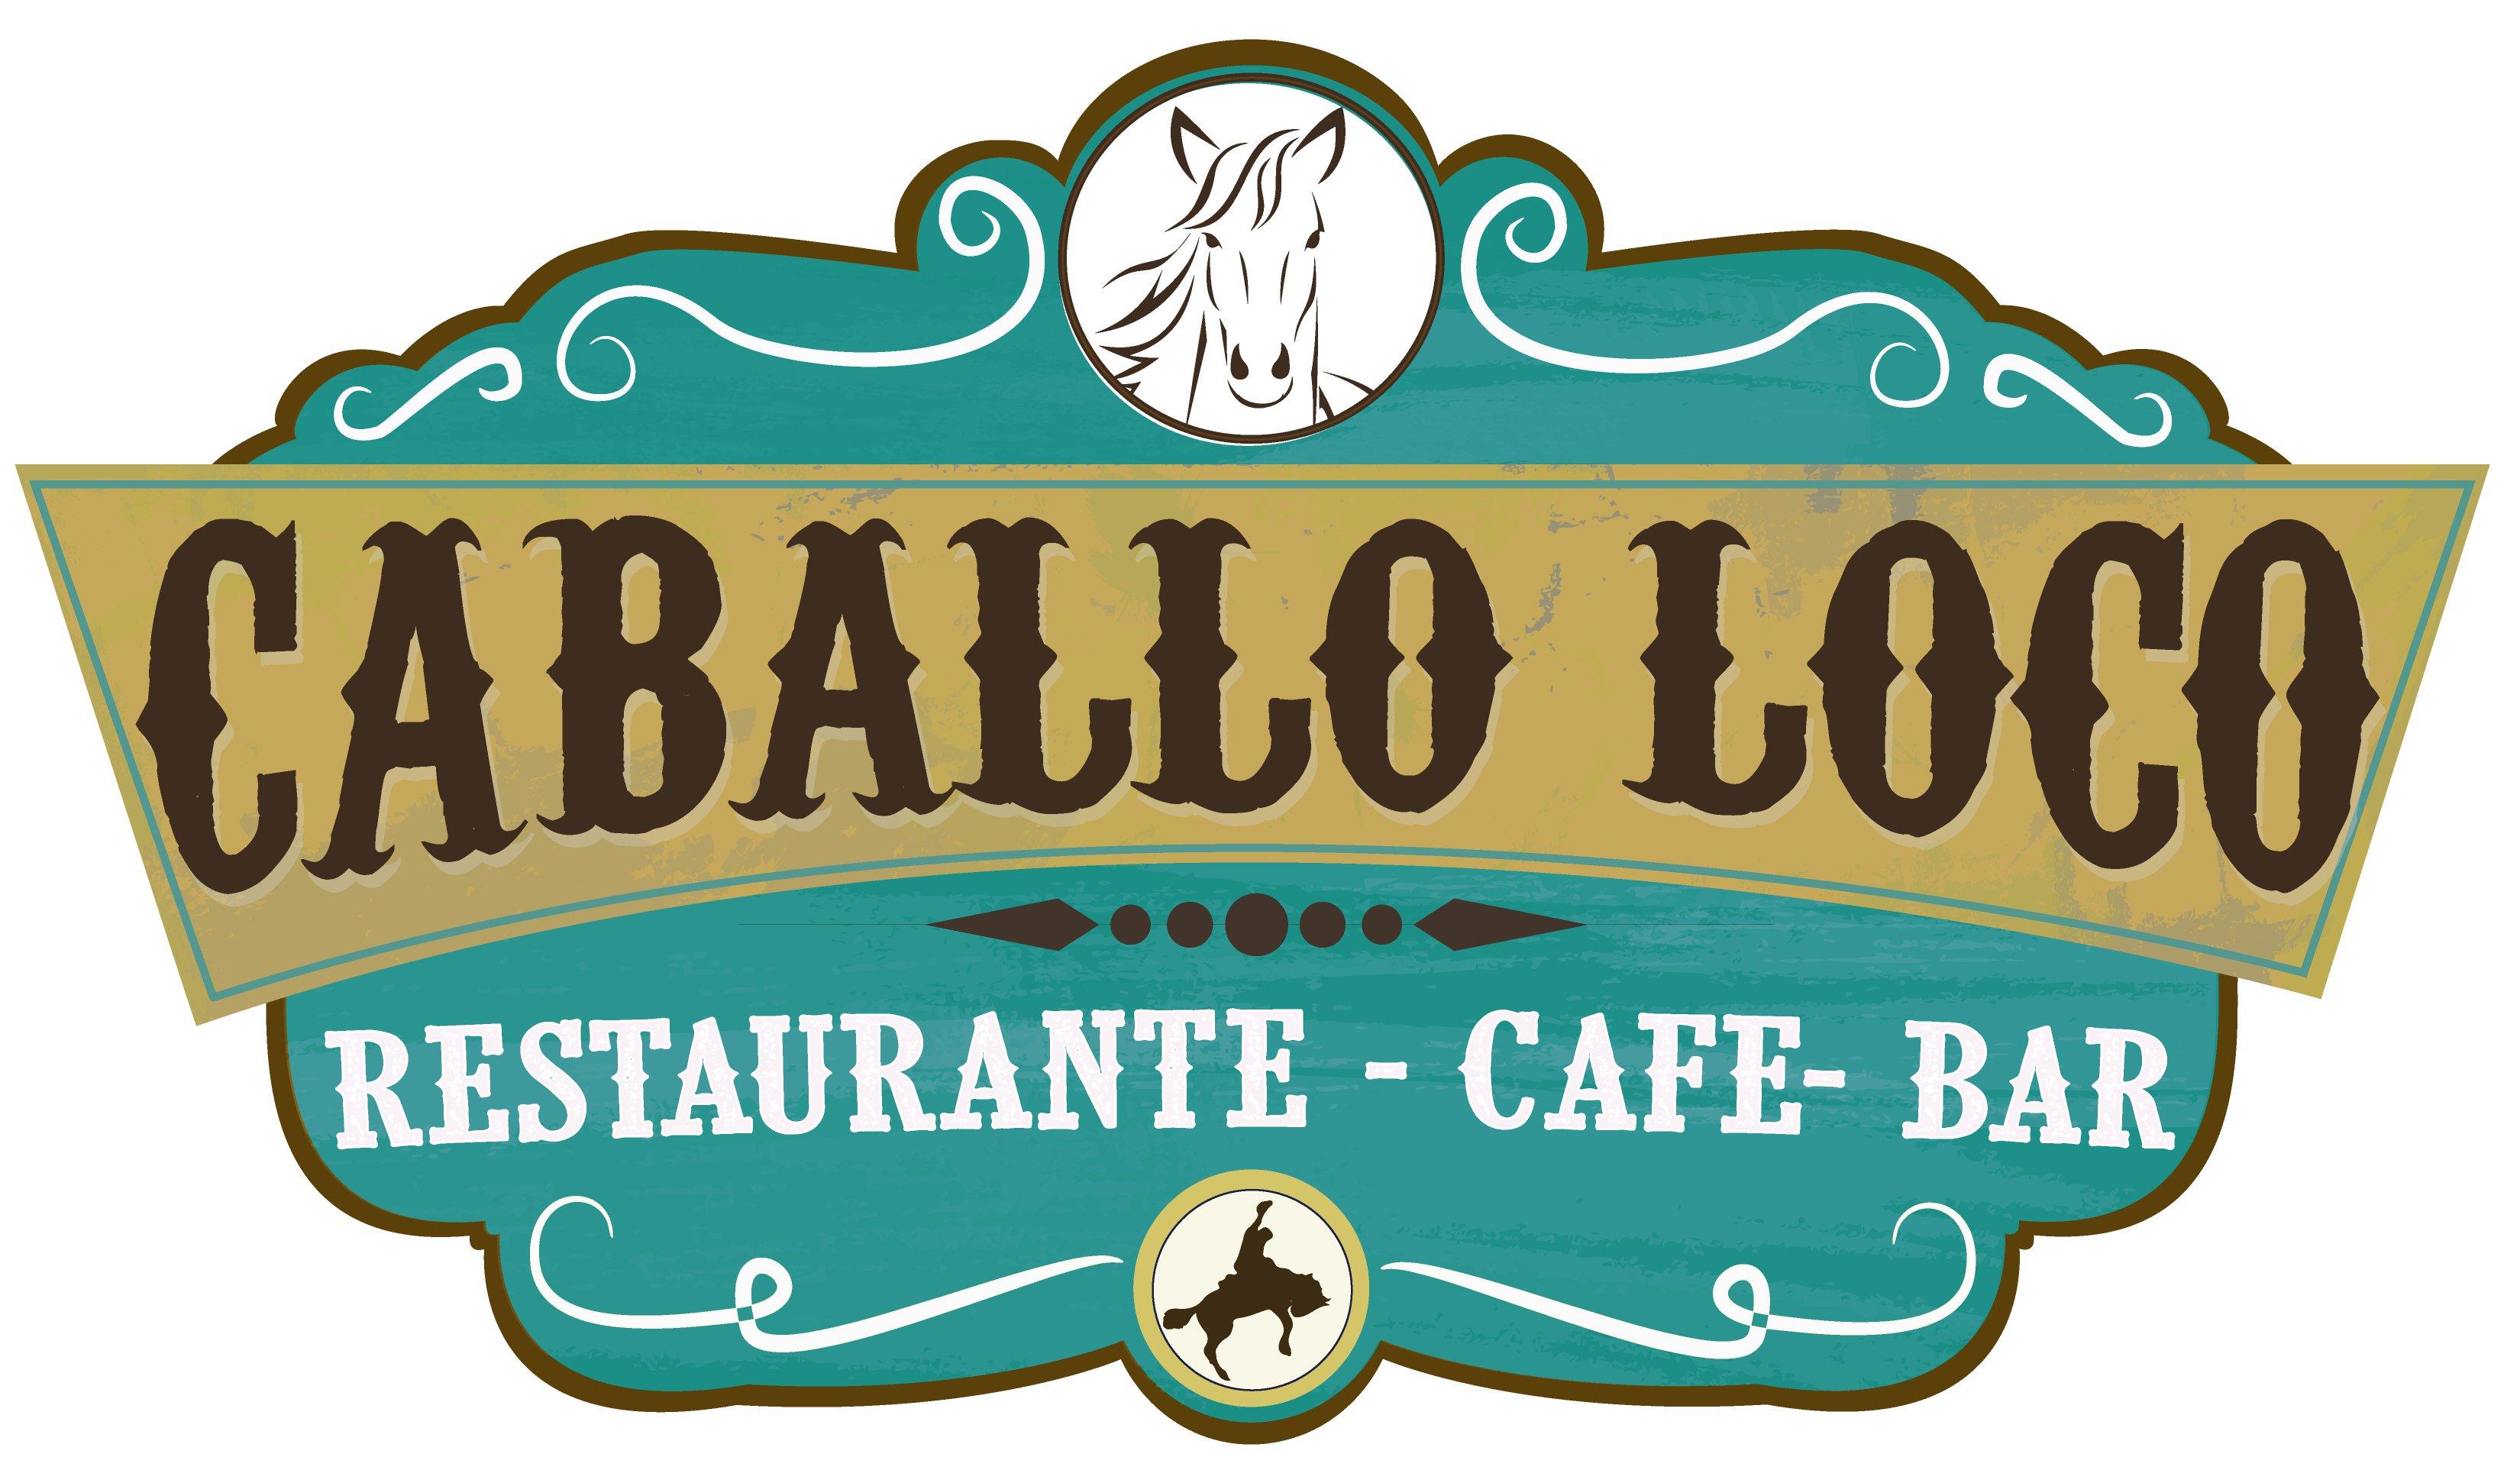 Caballo Loco Restaurante